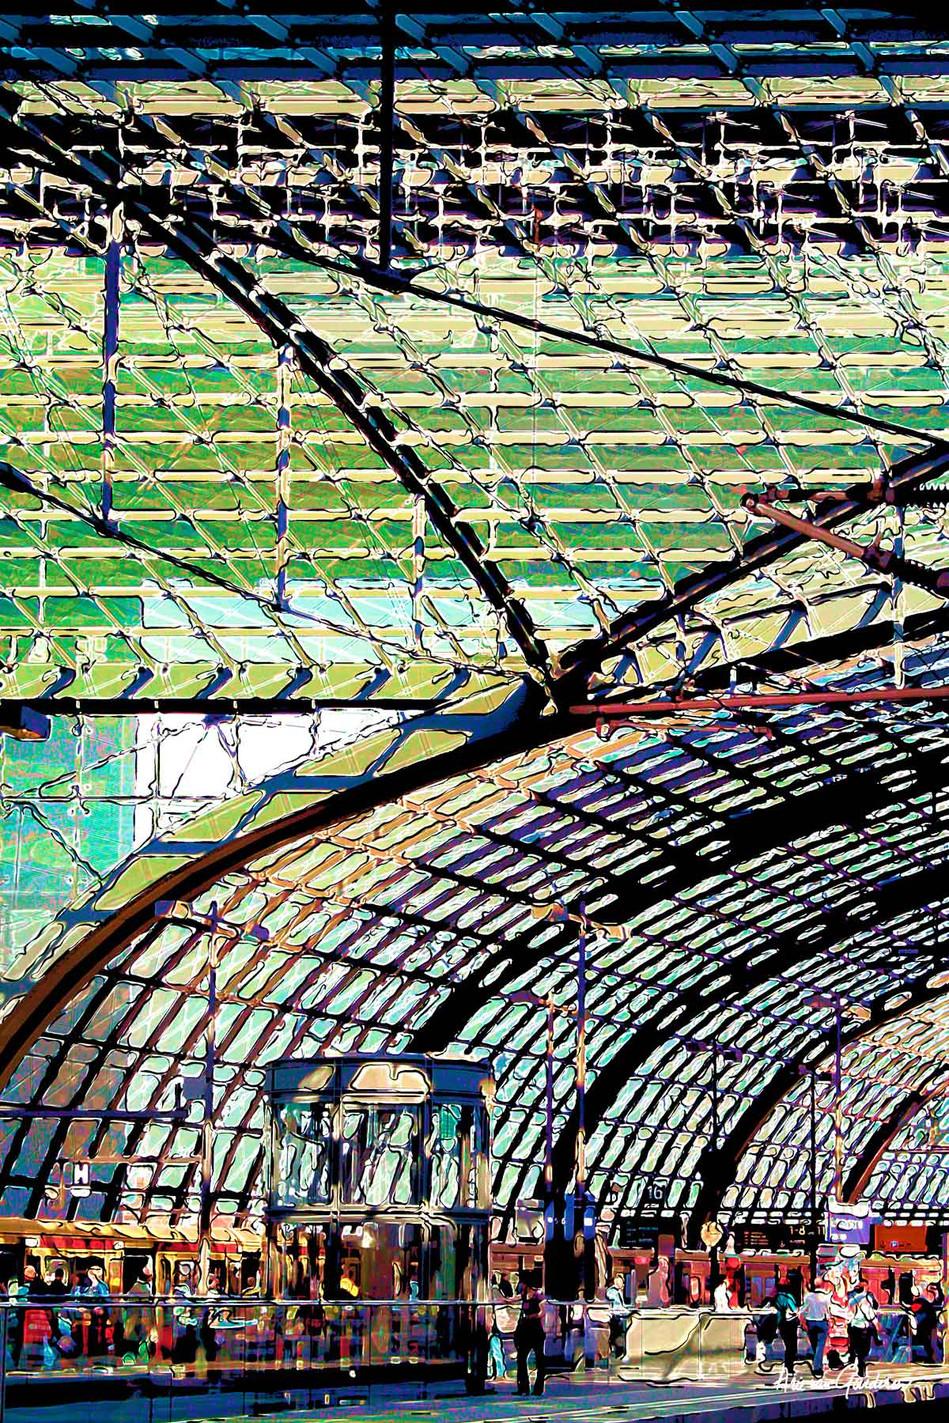 Multicolloured-Bahnhof-1.0.jpg